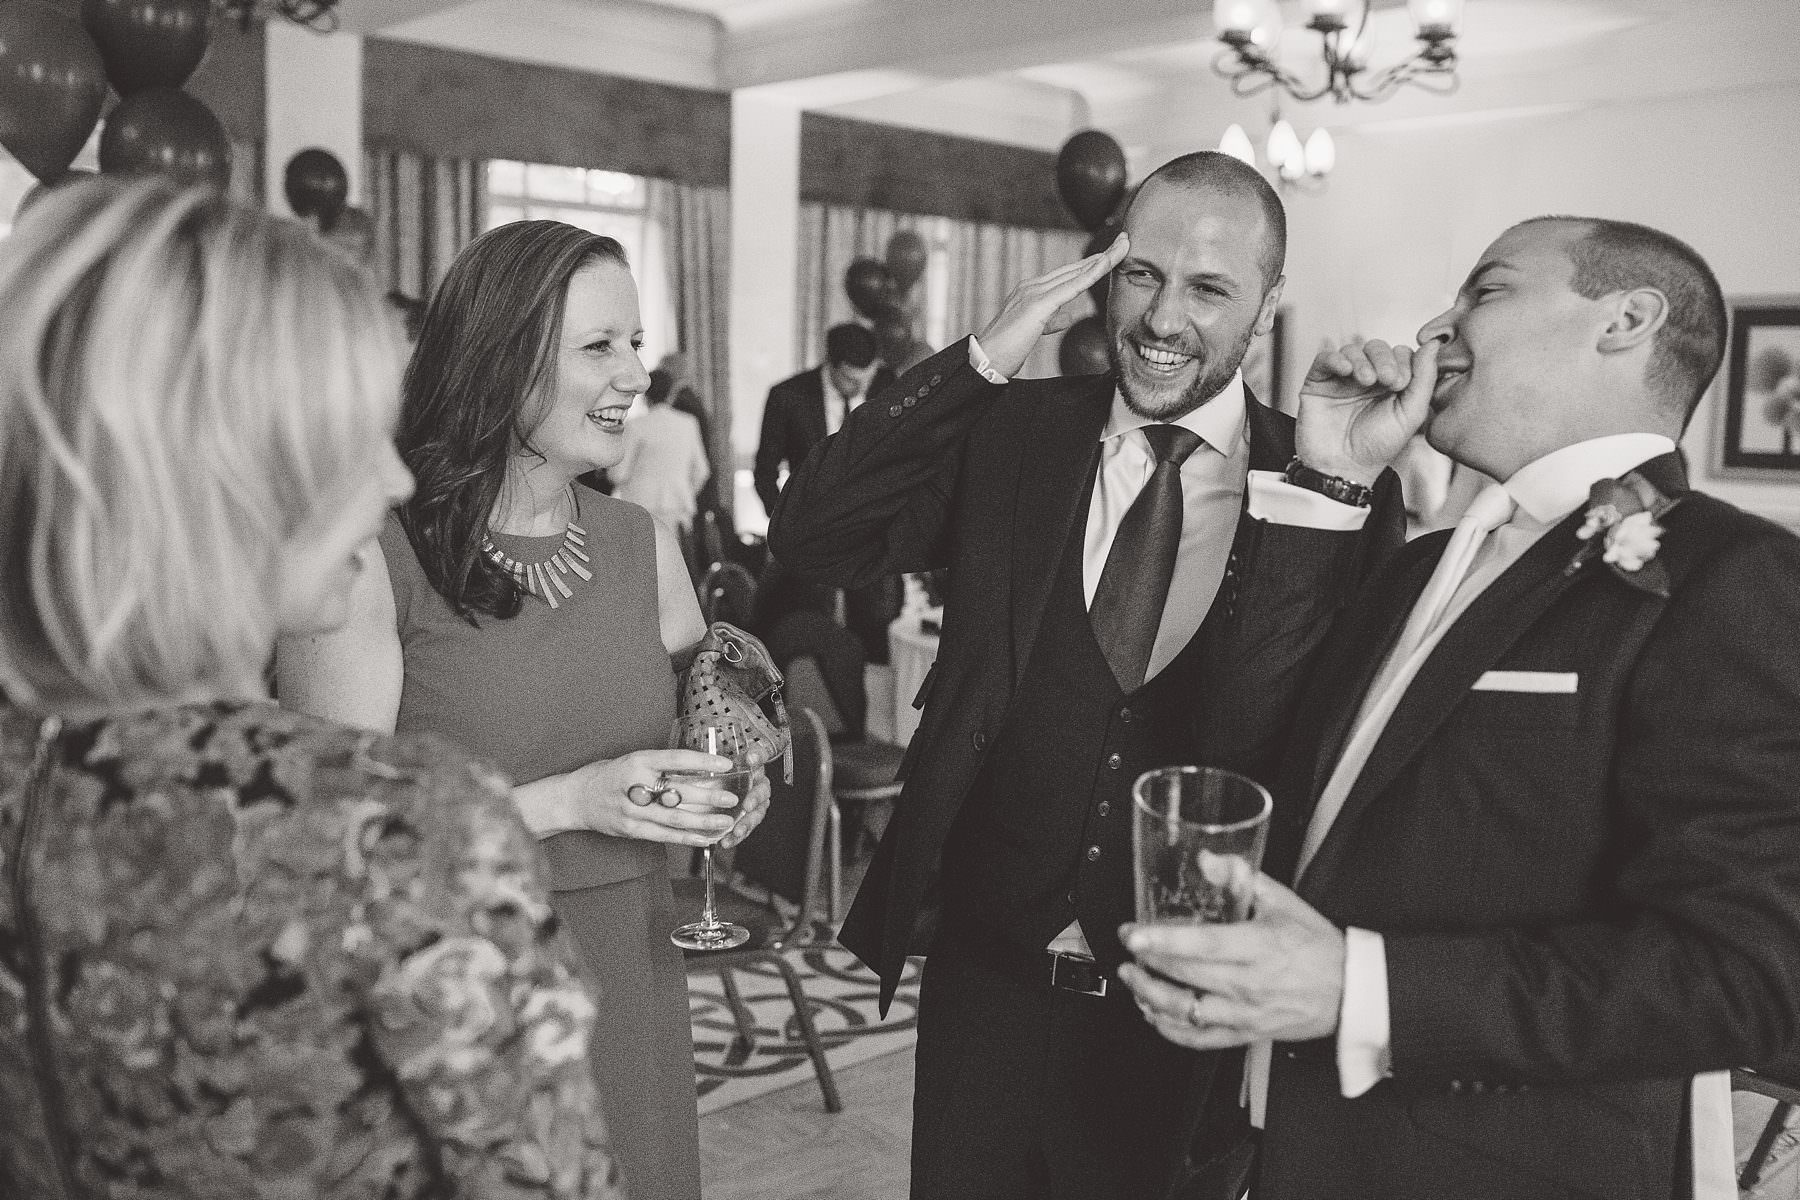 weddings-at-bristol-zoo-039